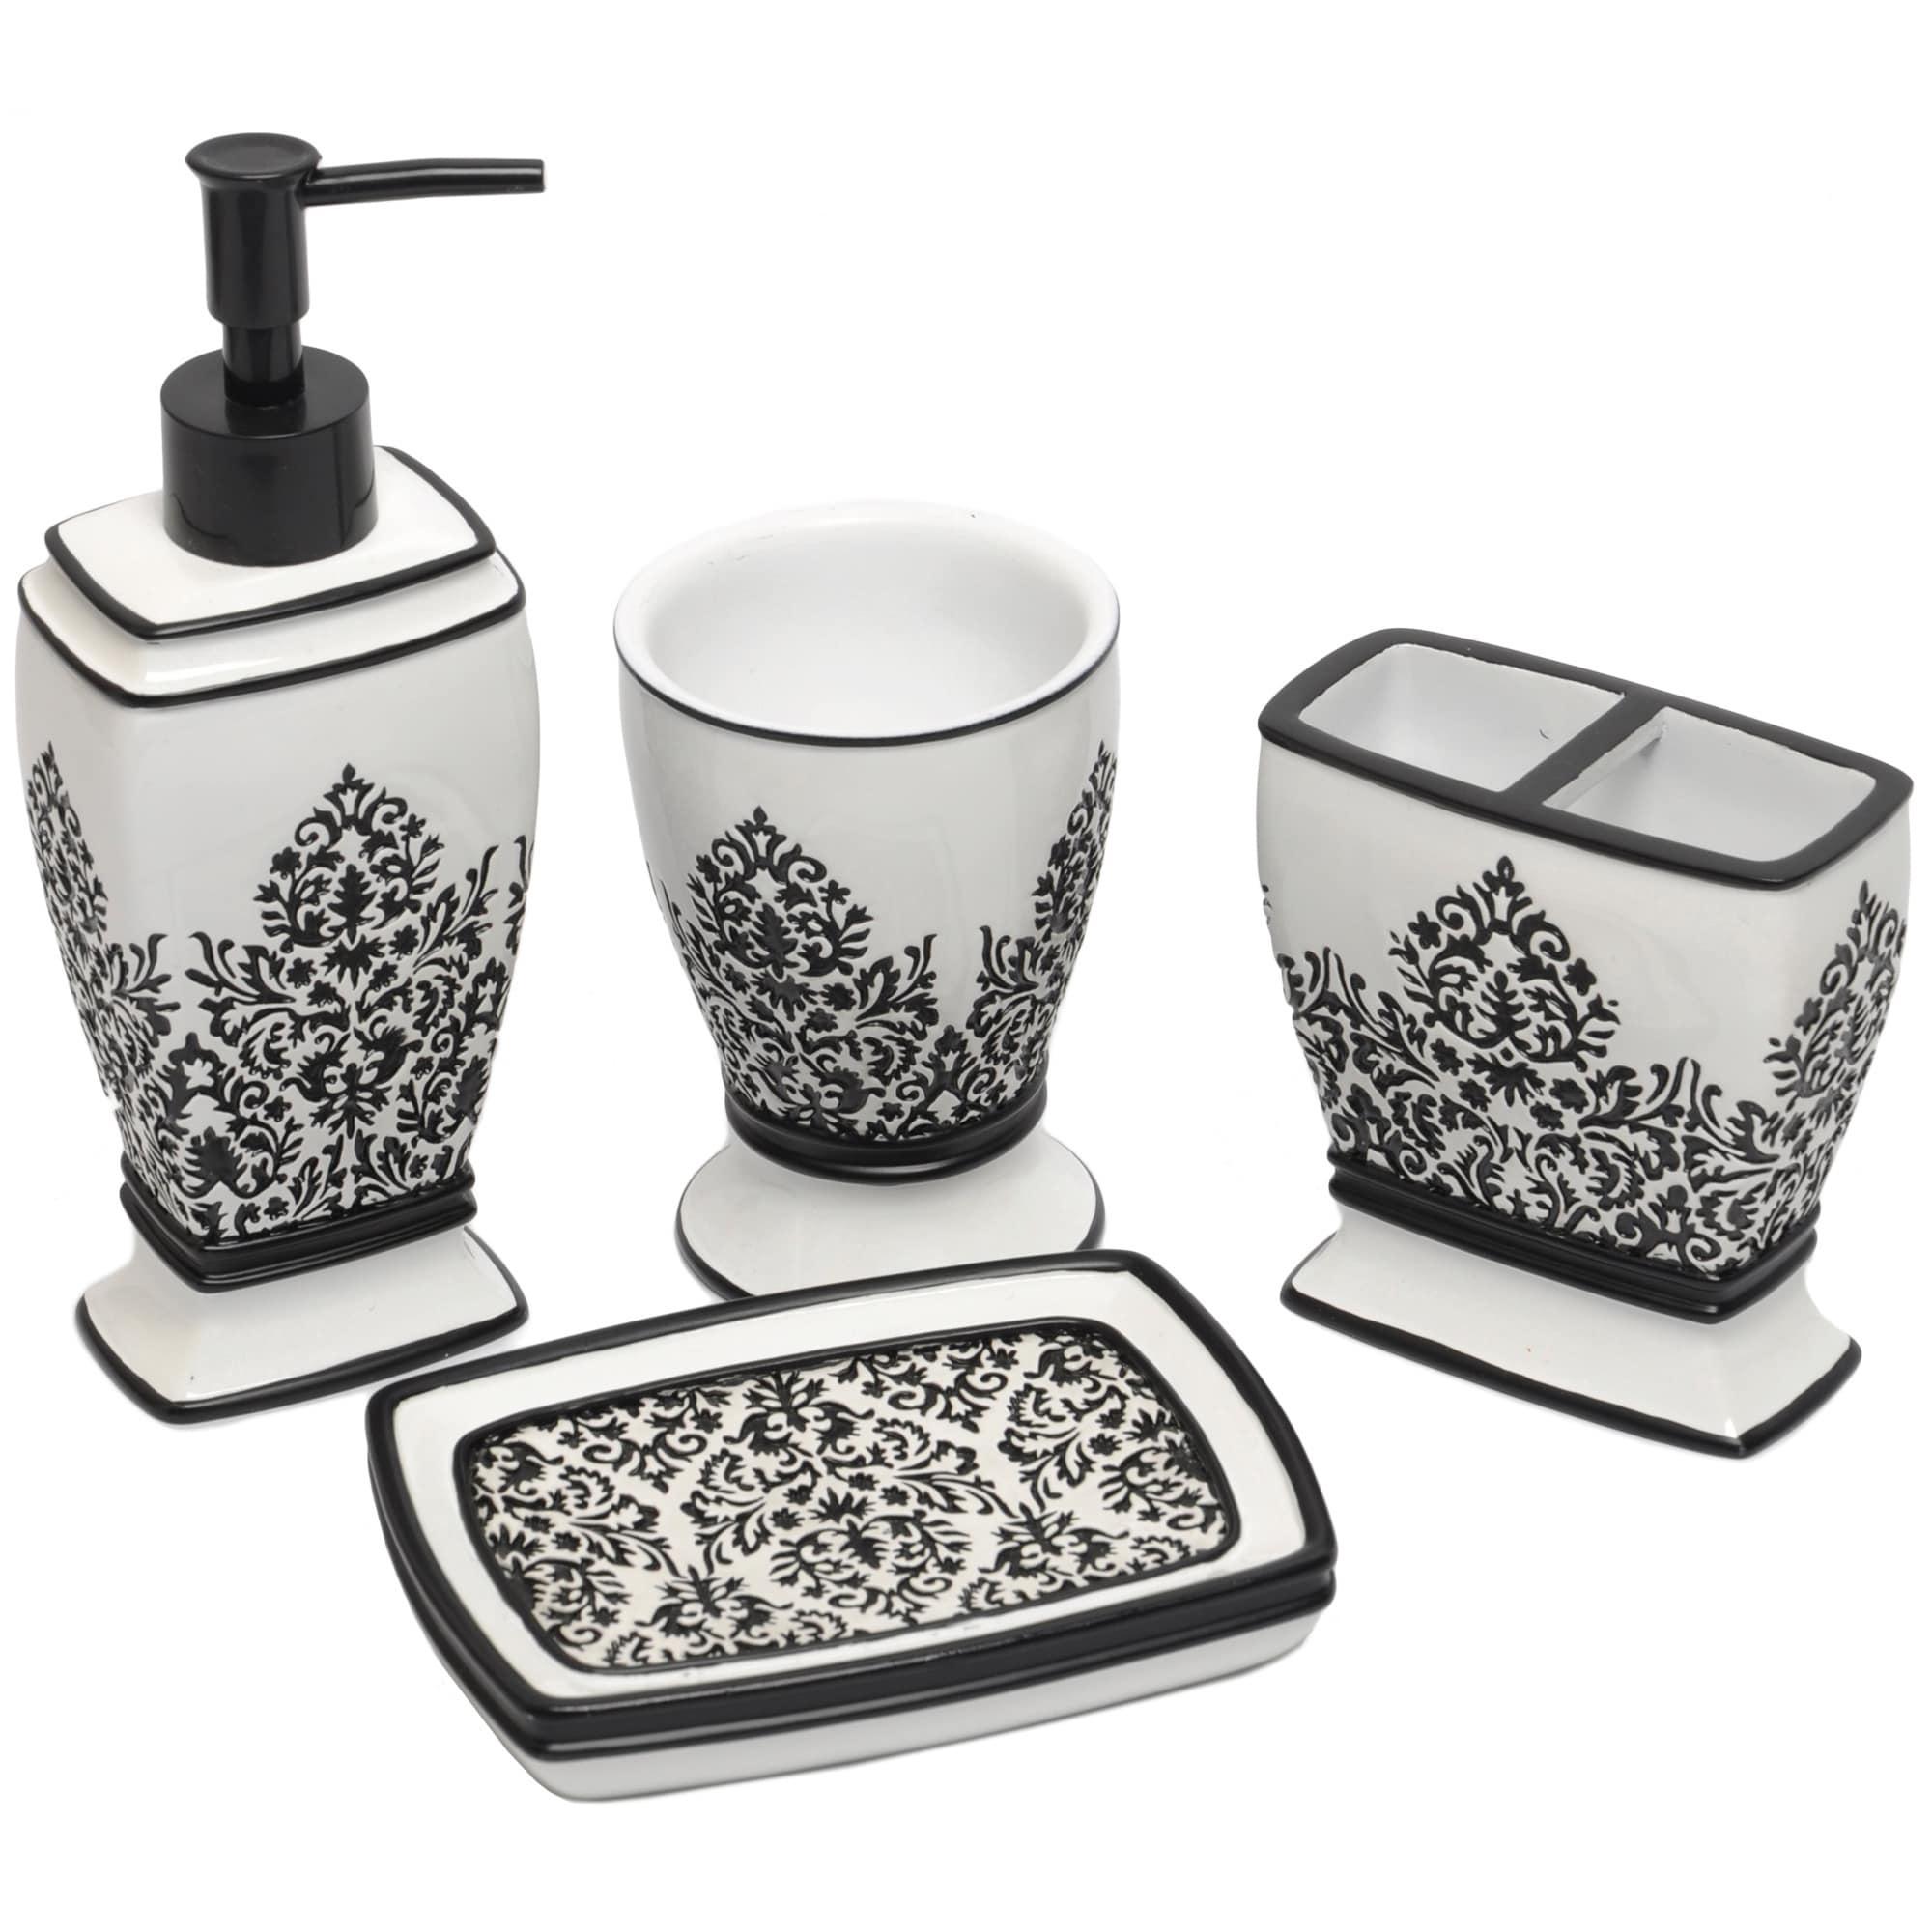 Shop Black/ White Damask Bath Accessory 4-piece Set - Free Shipping ...